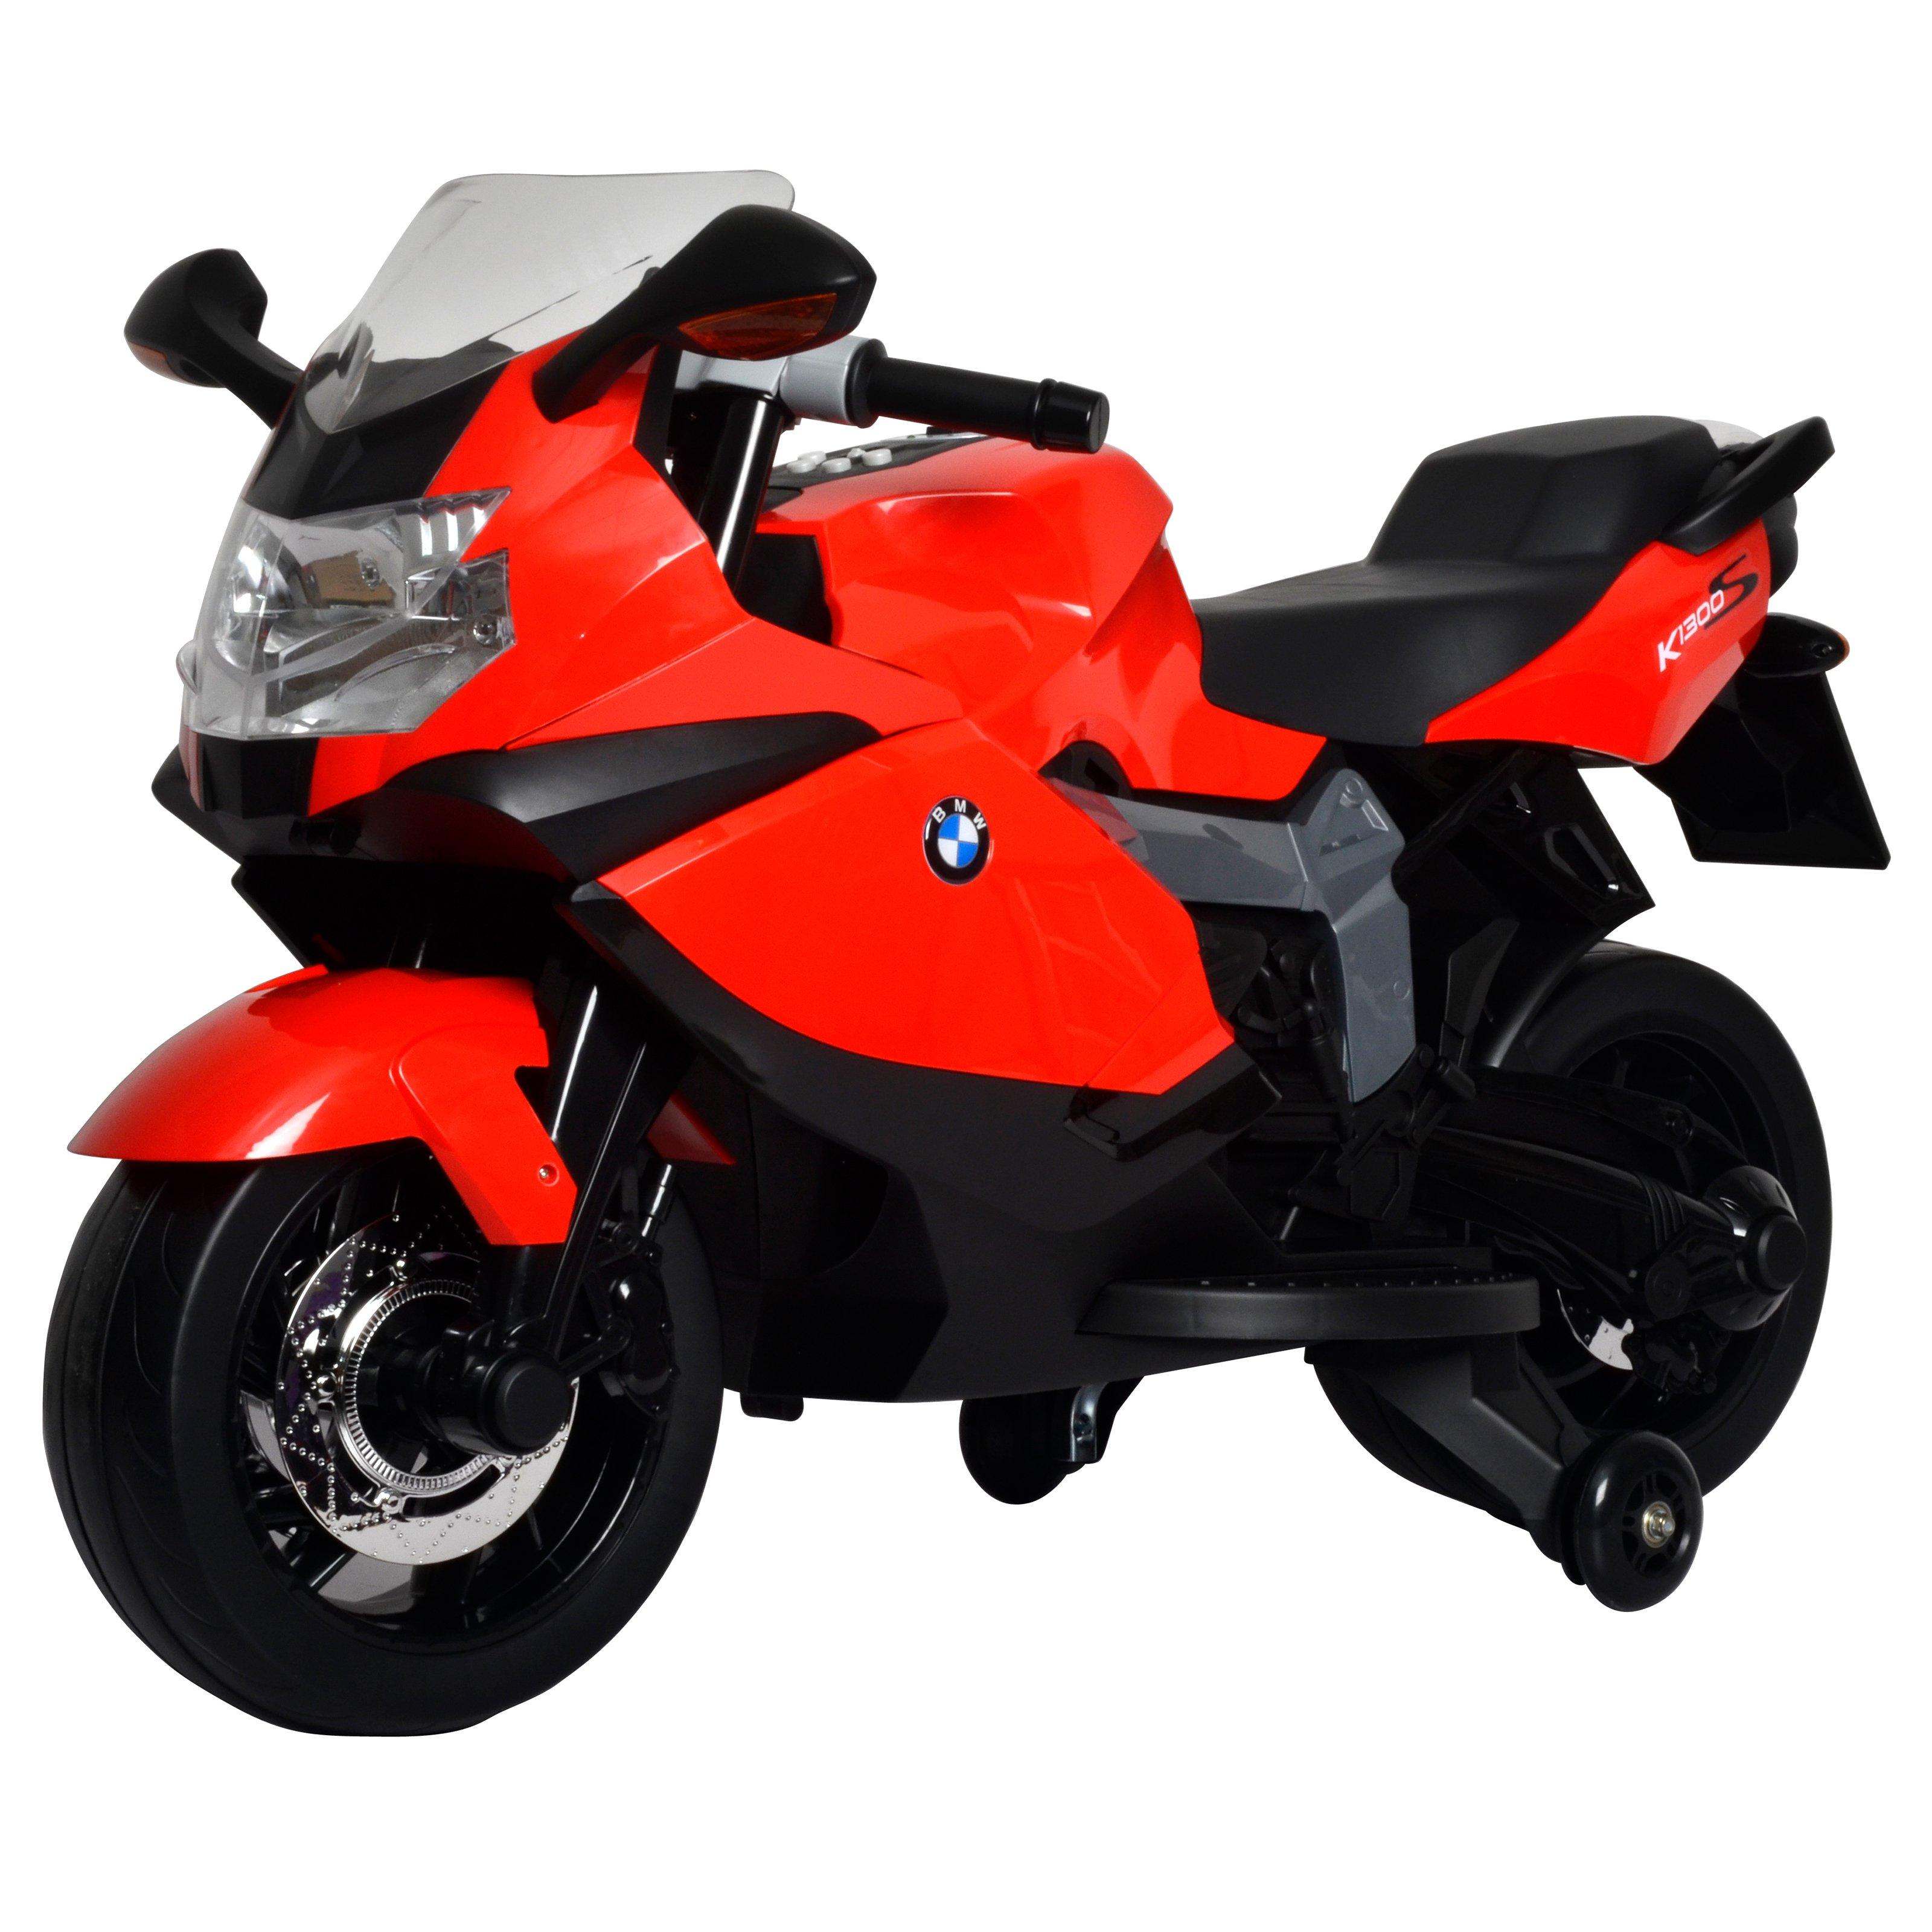 Motorcycles - Kamisco